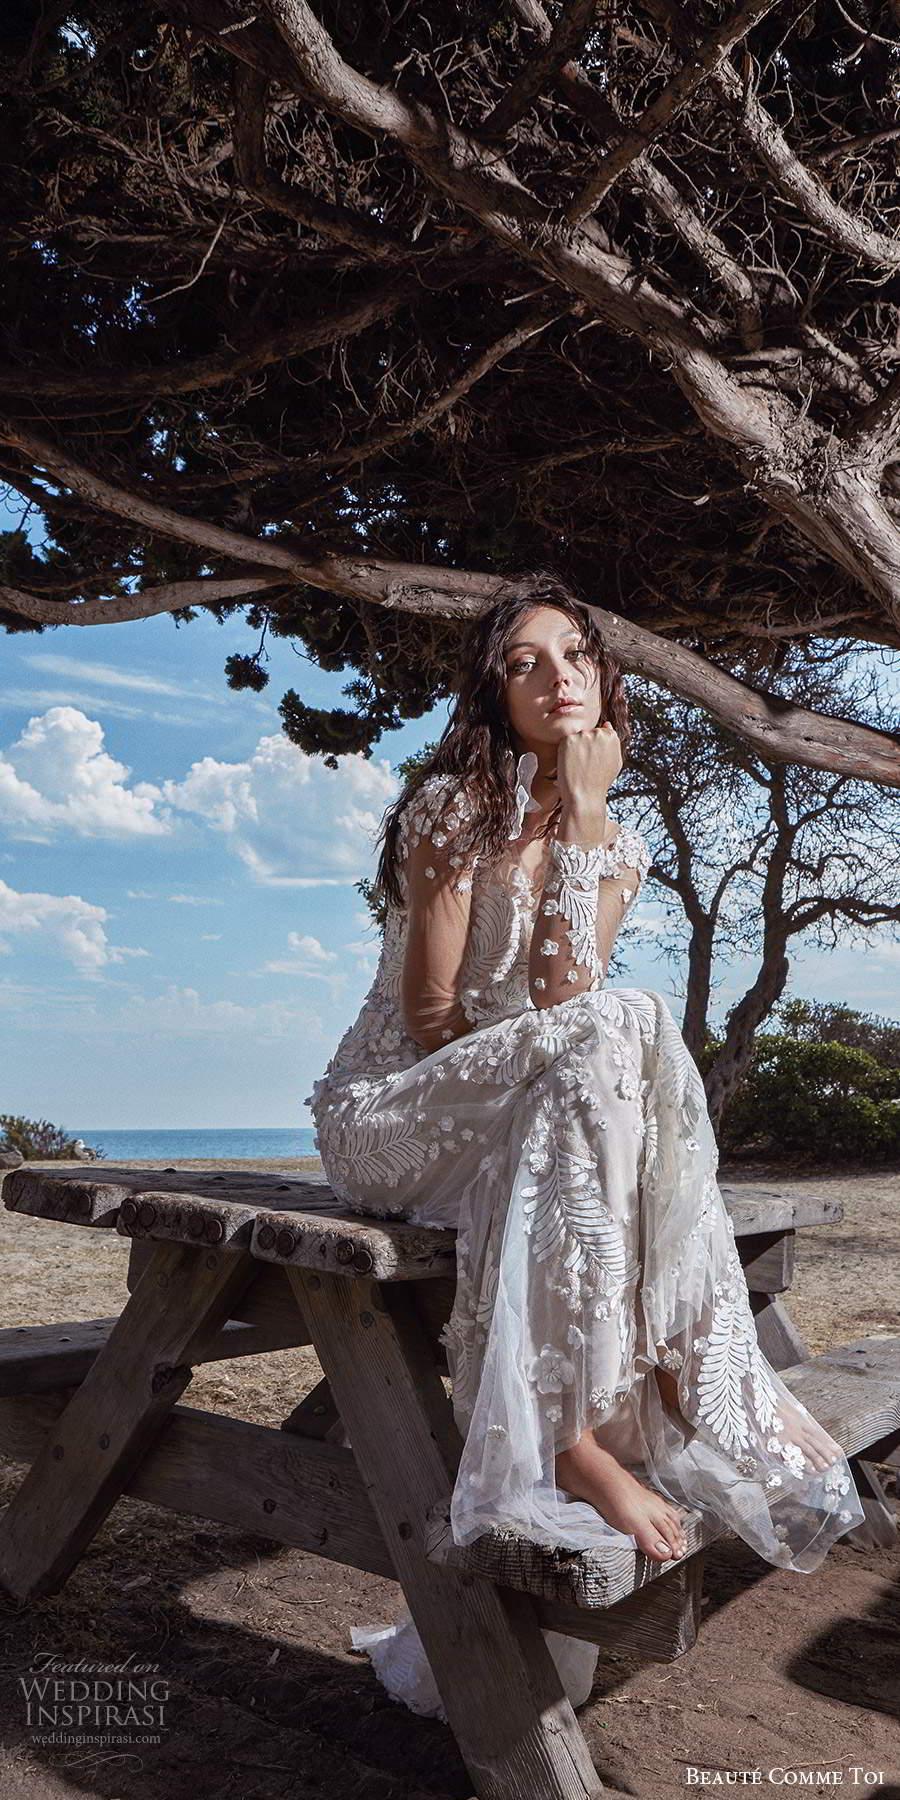 beaute comme toi f2020 bridal long sleeves illusion bateau neckline full embellishment elegant sheath wedding dress backless low back short train (5) fv